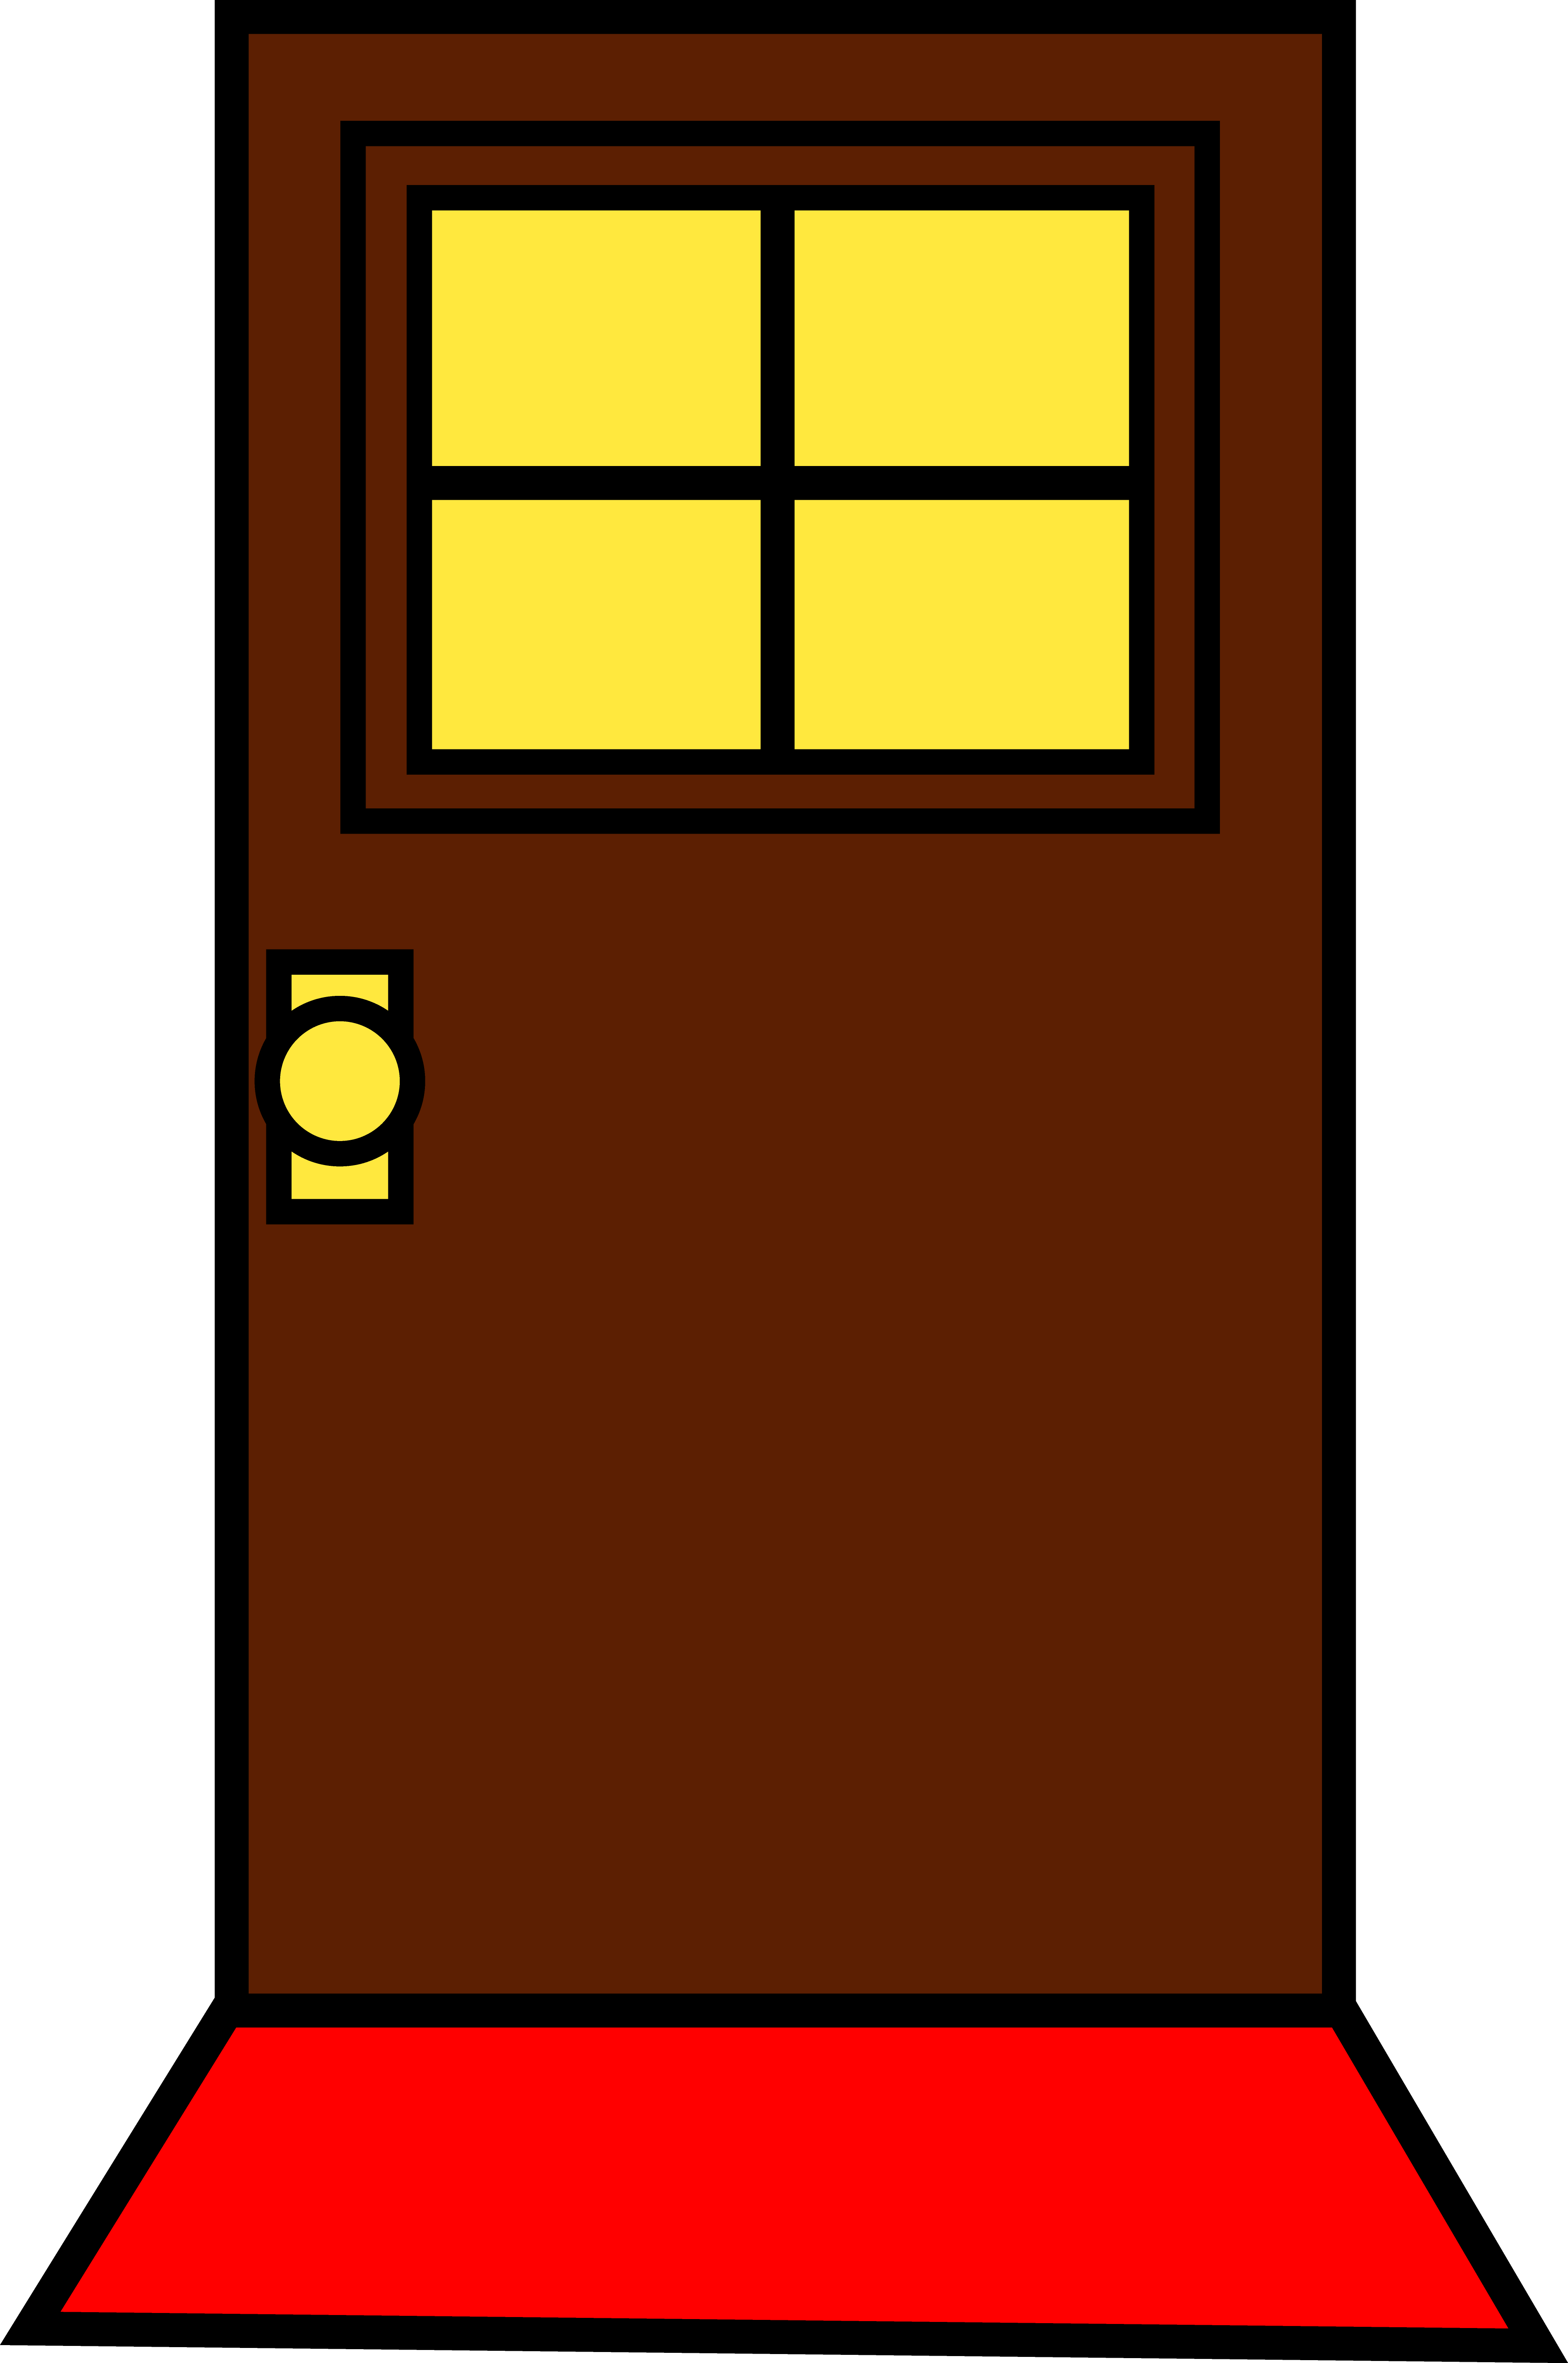 Classroom Door Clipart-classroom door clipart-0